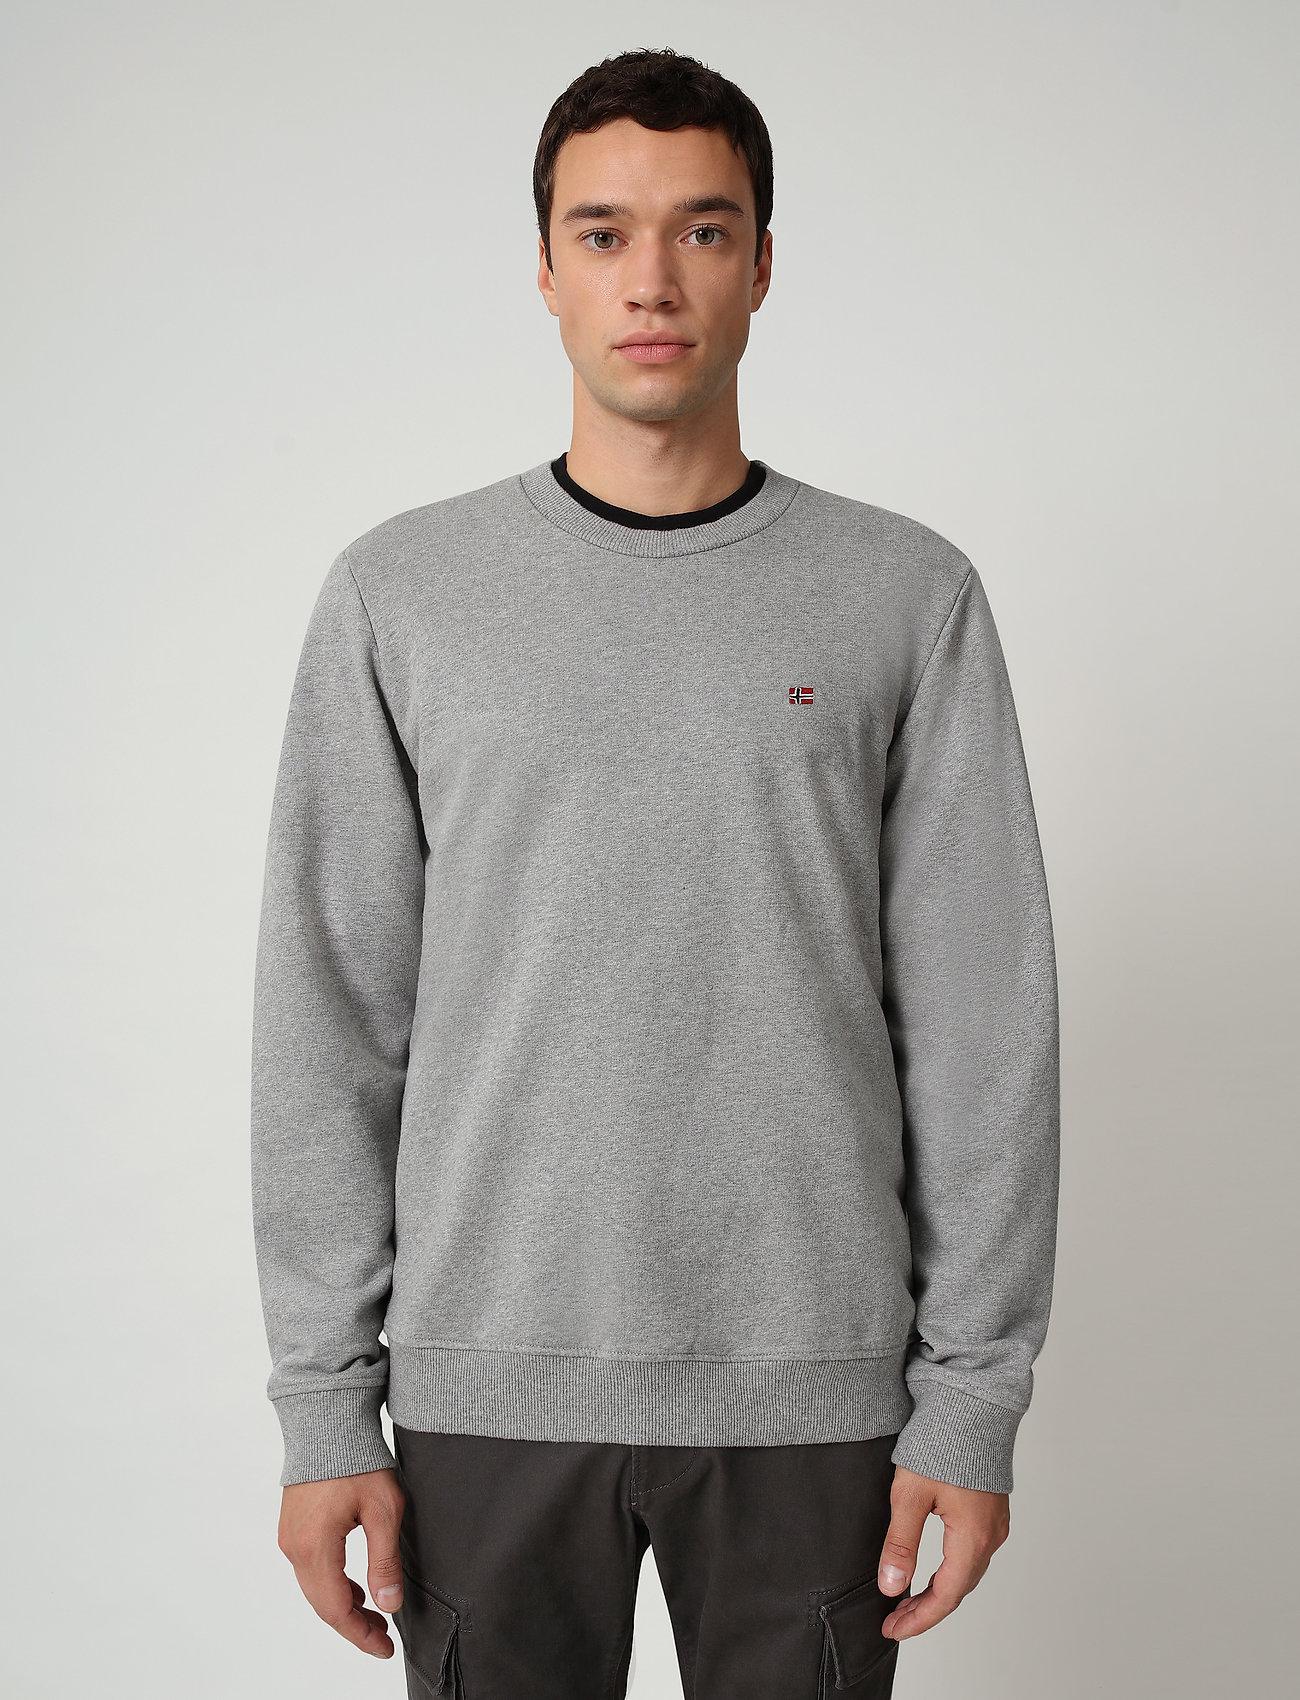 Napapijri - BALIS CREW - tricots basiques - med grey melange - 0